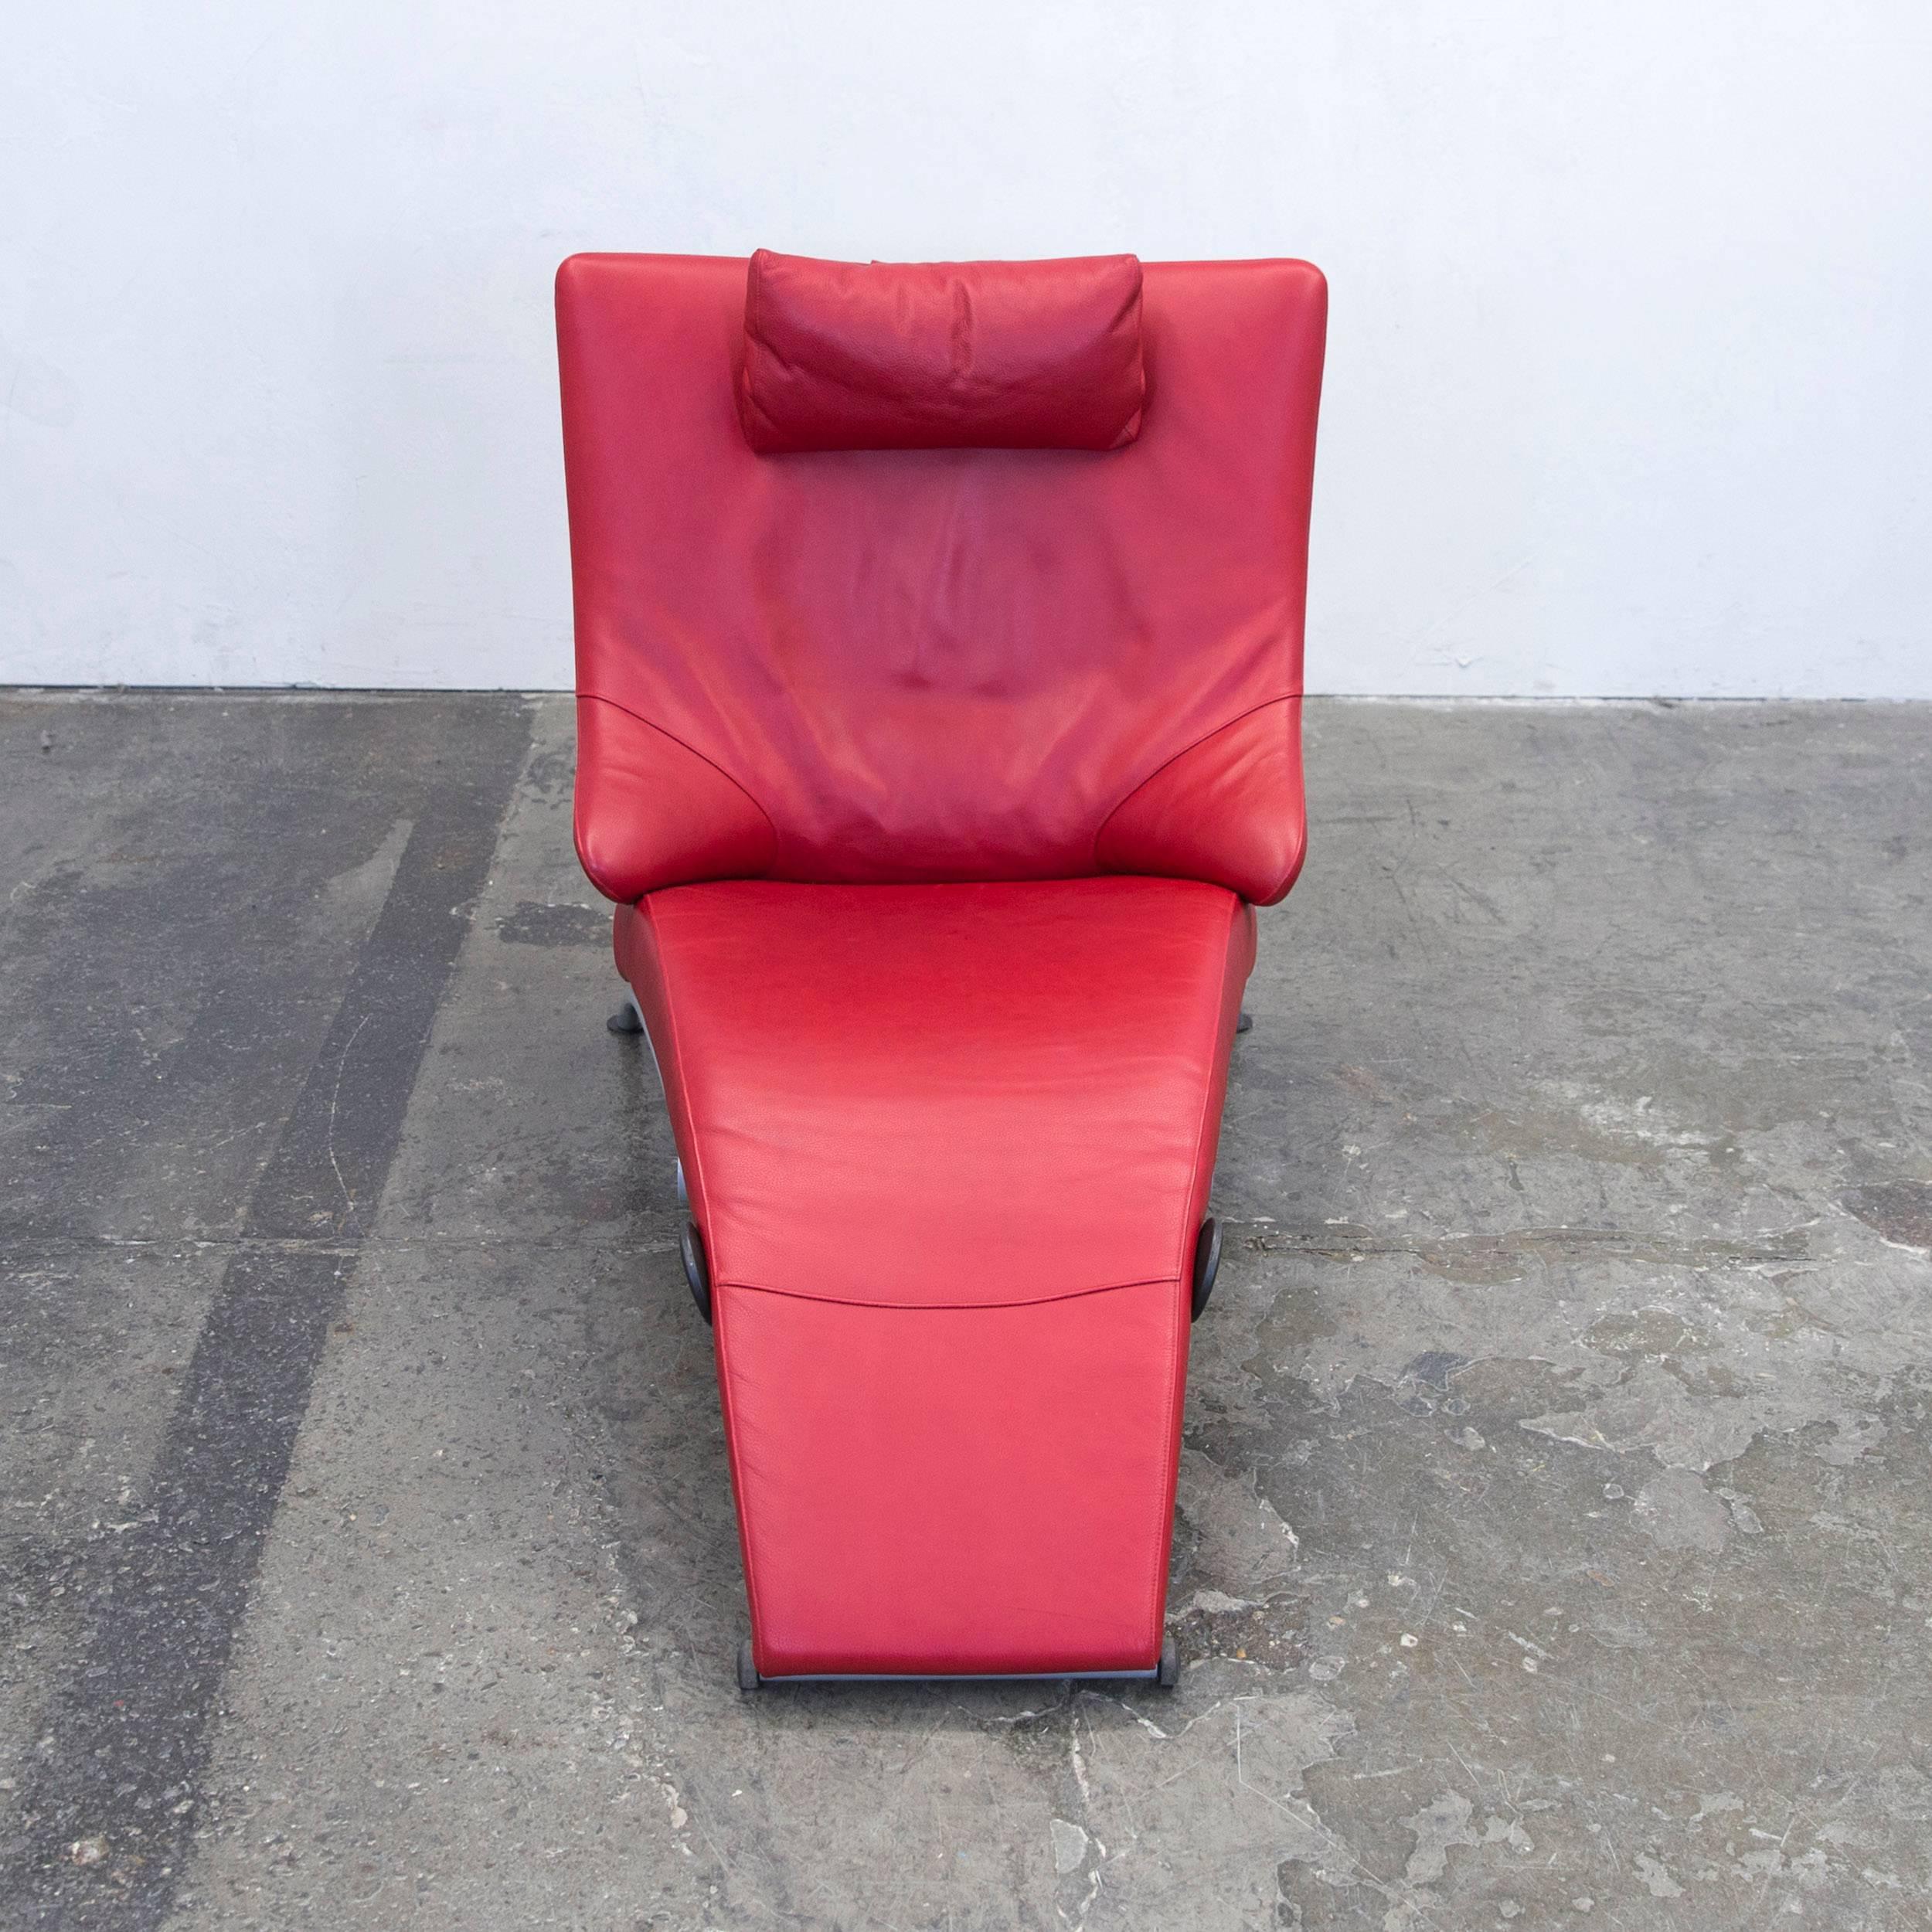 wk sofa leder simple wk sofa einzigartig aktuell with wk sofa leder great with wk sofa leder. Black Bedroom Furniture Sets. Home Design Ideas